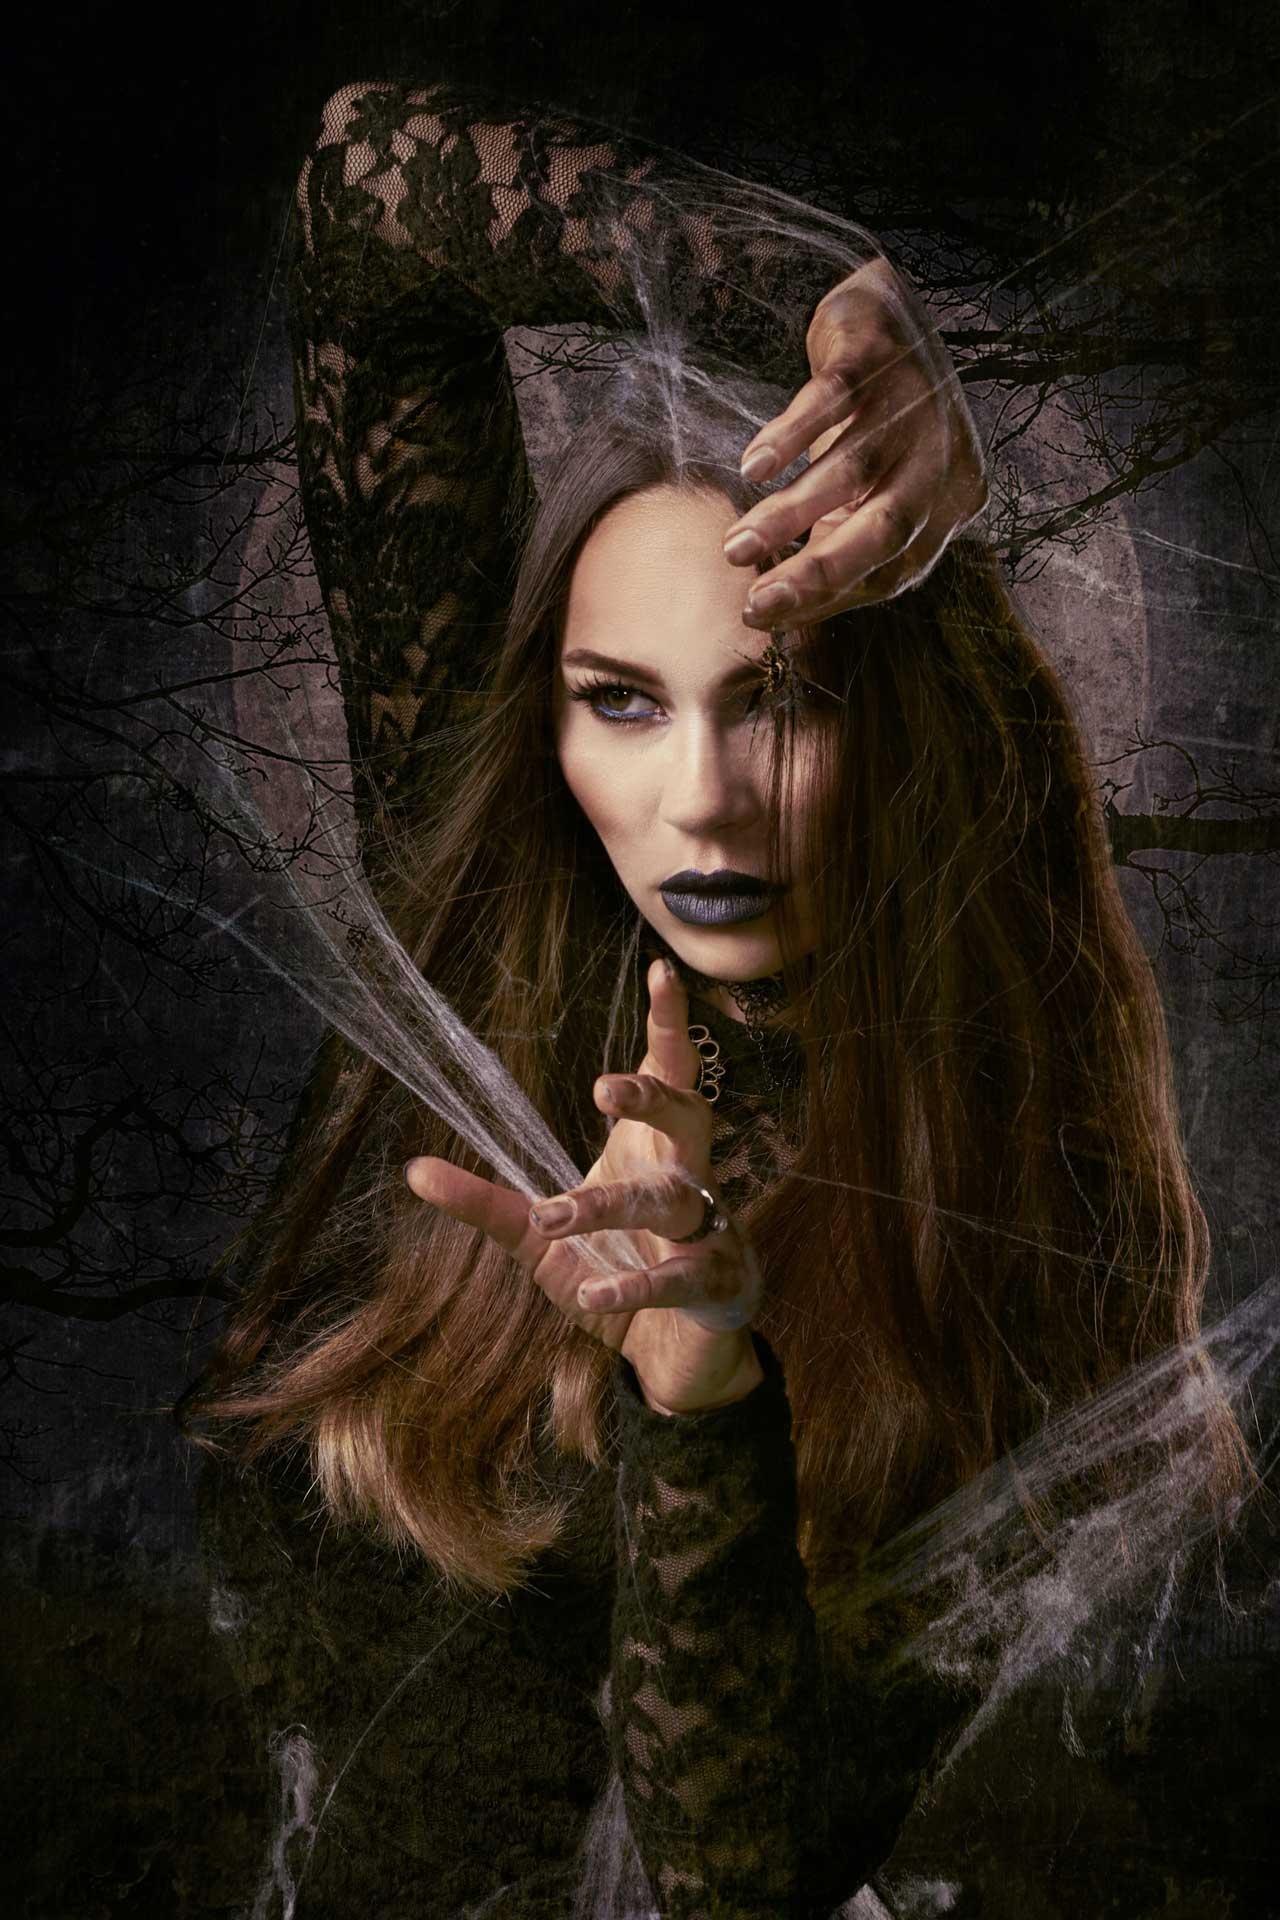 foto di JJ Jordan da <a href='https://www.pexels.com/it-it/foto/moda-mani-donna-modello-3125846/' target='_blank'>Pexels</a>